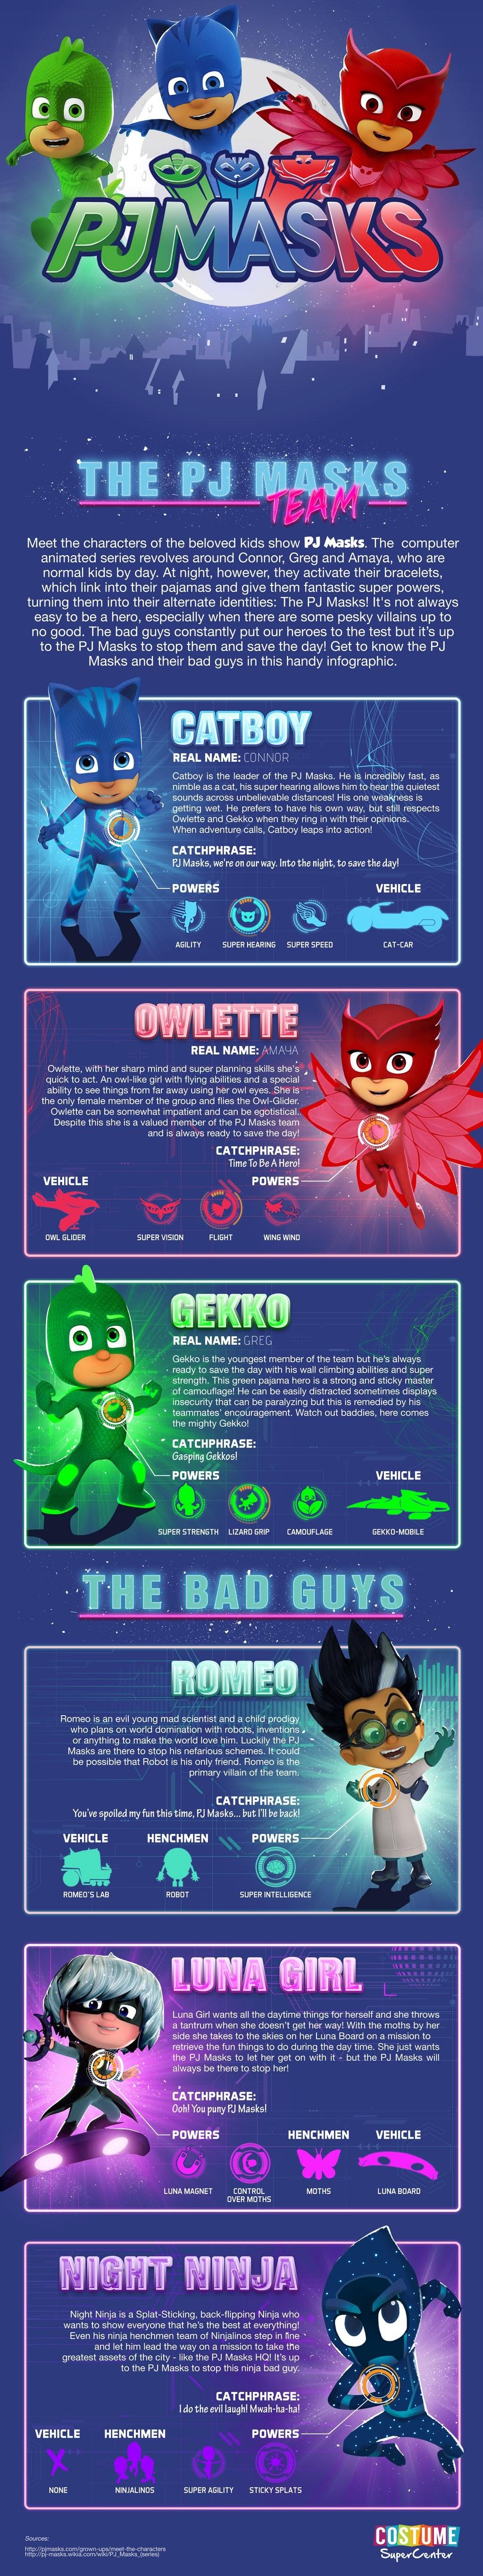 The PJ Masks Team #Infographic